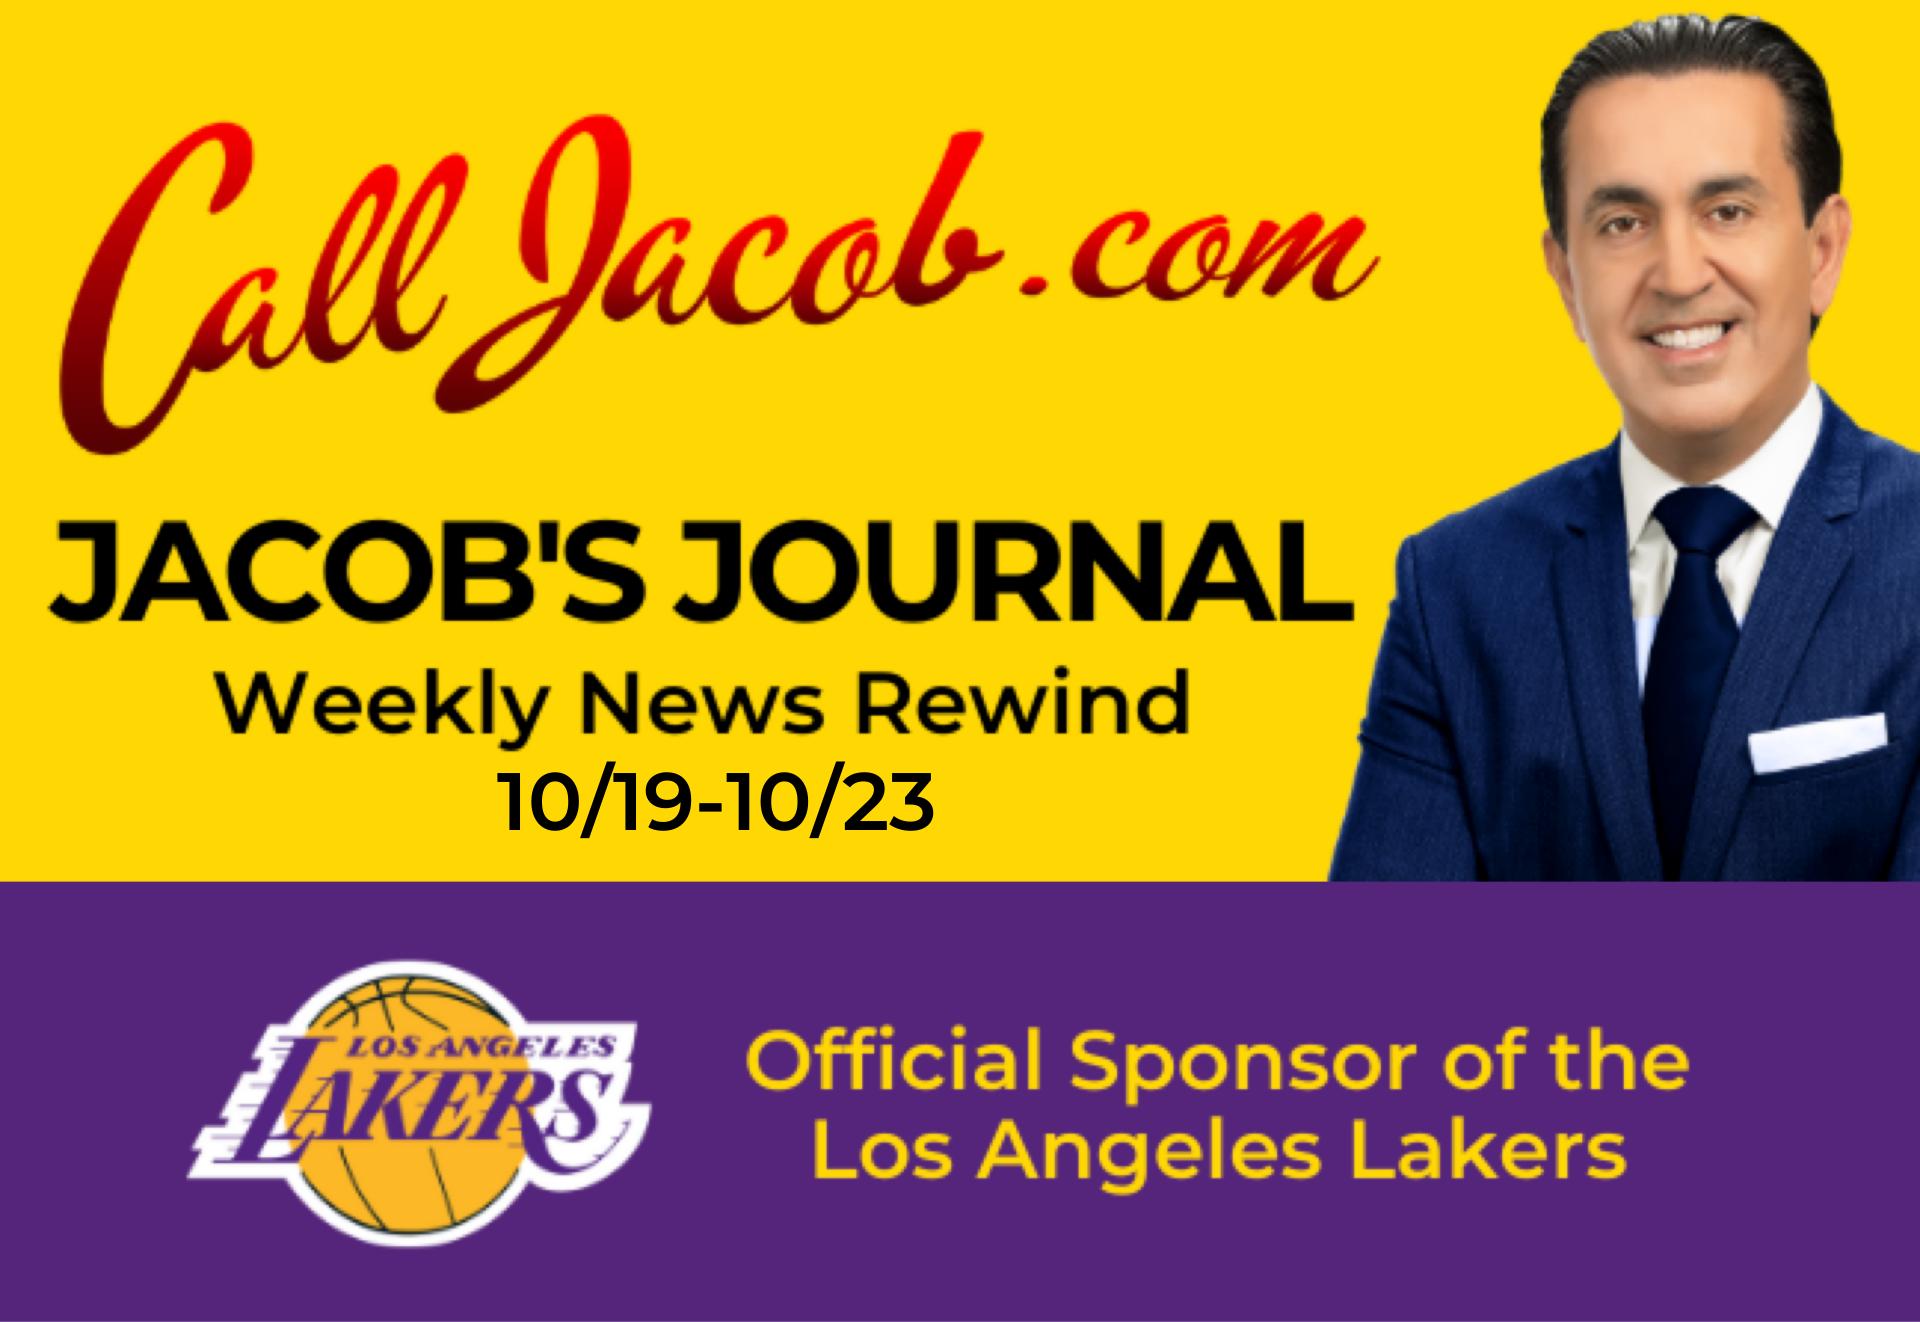 JacobsJournalWeeklyNewsRewind-10-19_10-23